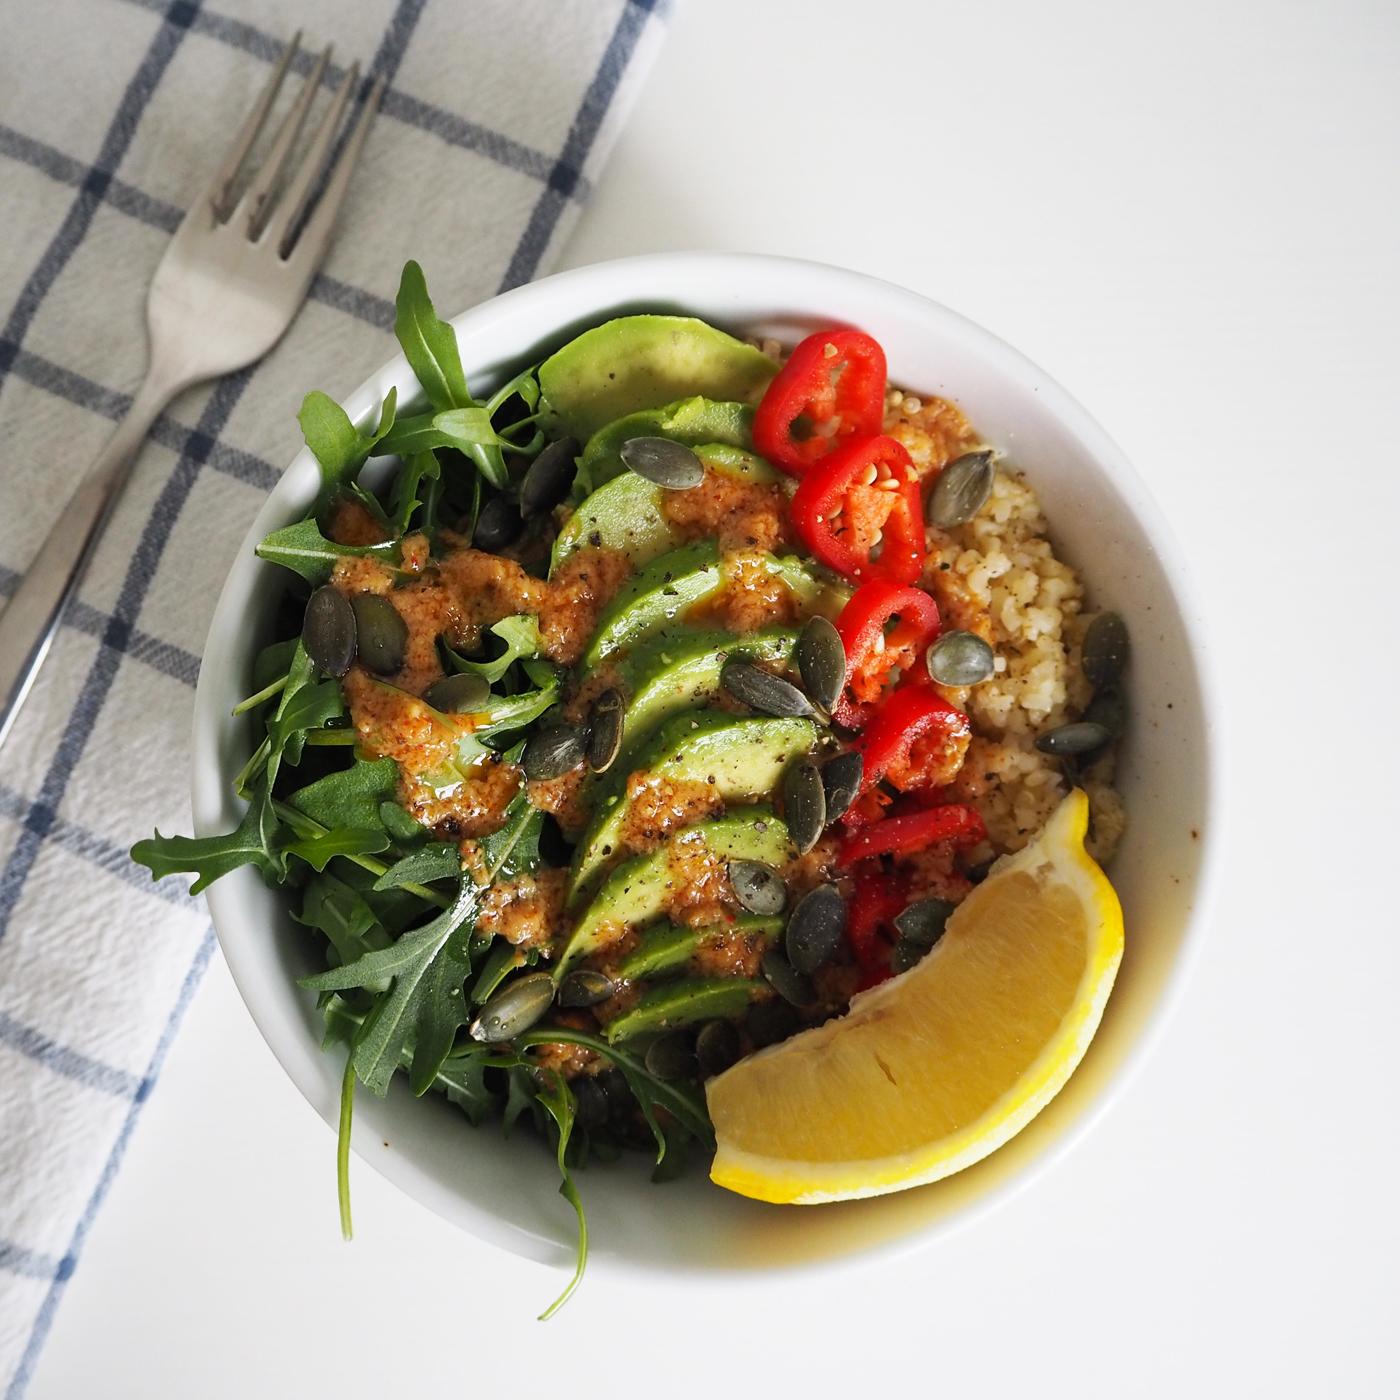 Miso rocket and avocado quinoa bowl